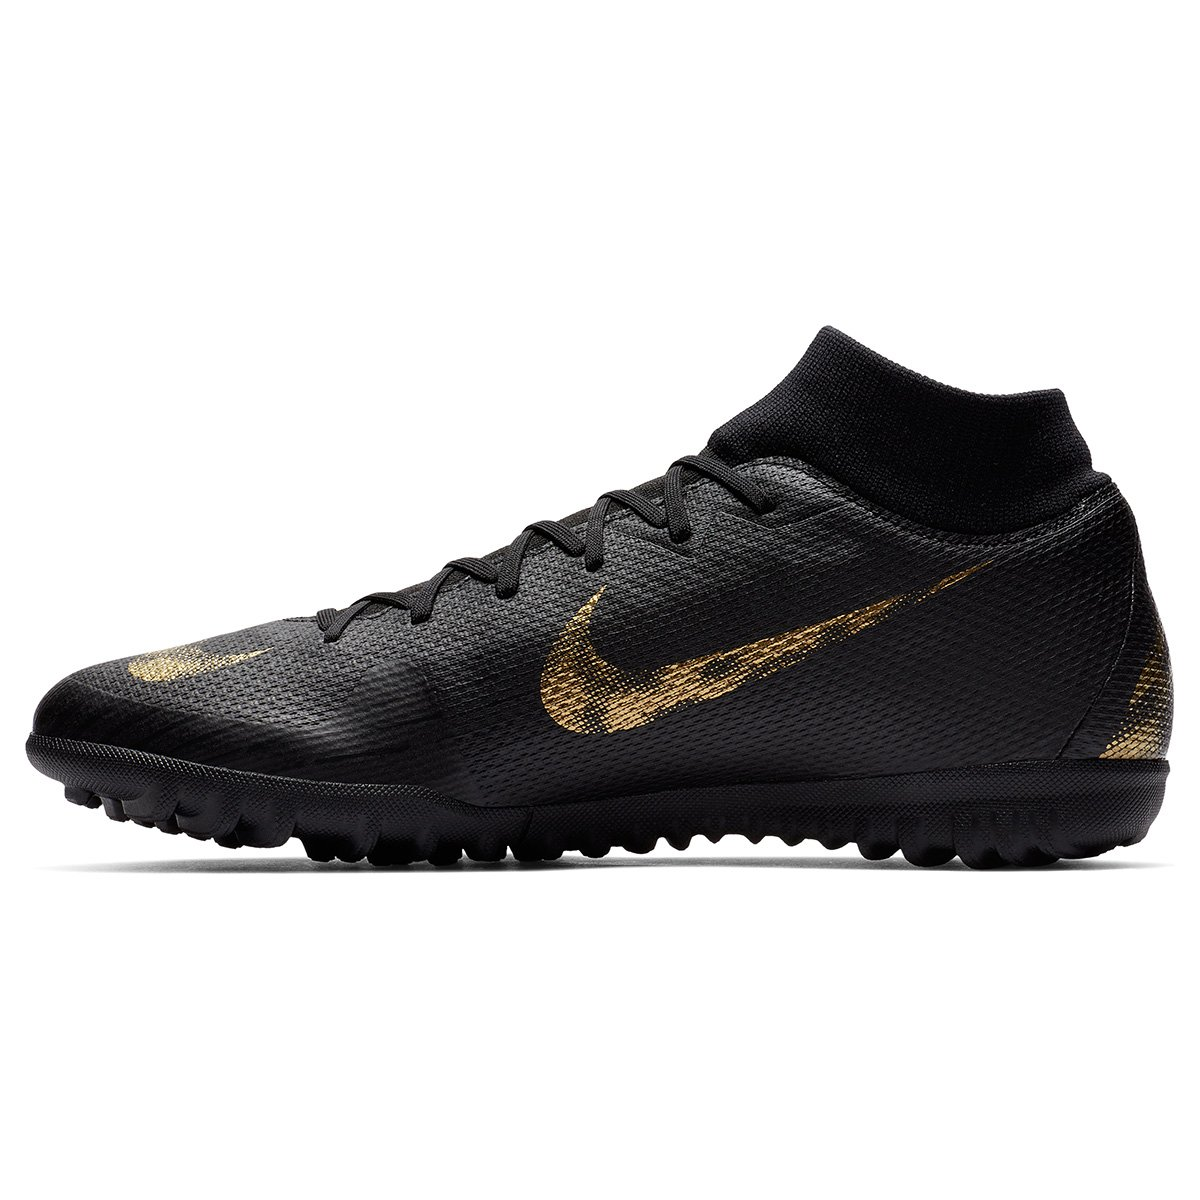 fe75d602cbdae Chuteira Society Nike Mercurial Superfly 6 Academy - Preto e Dourado -  Compre Agora